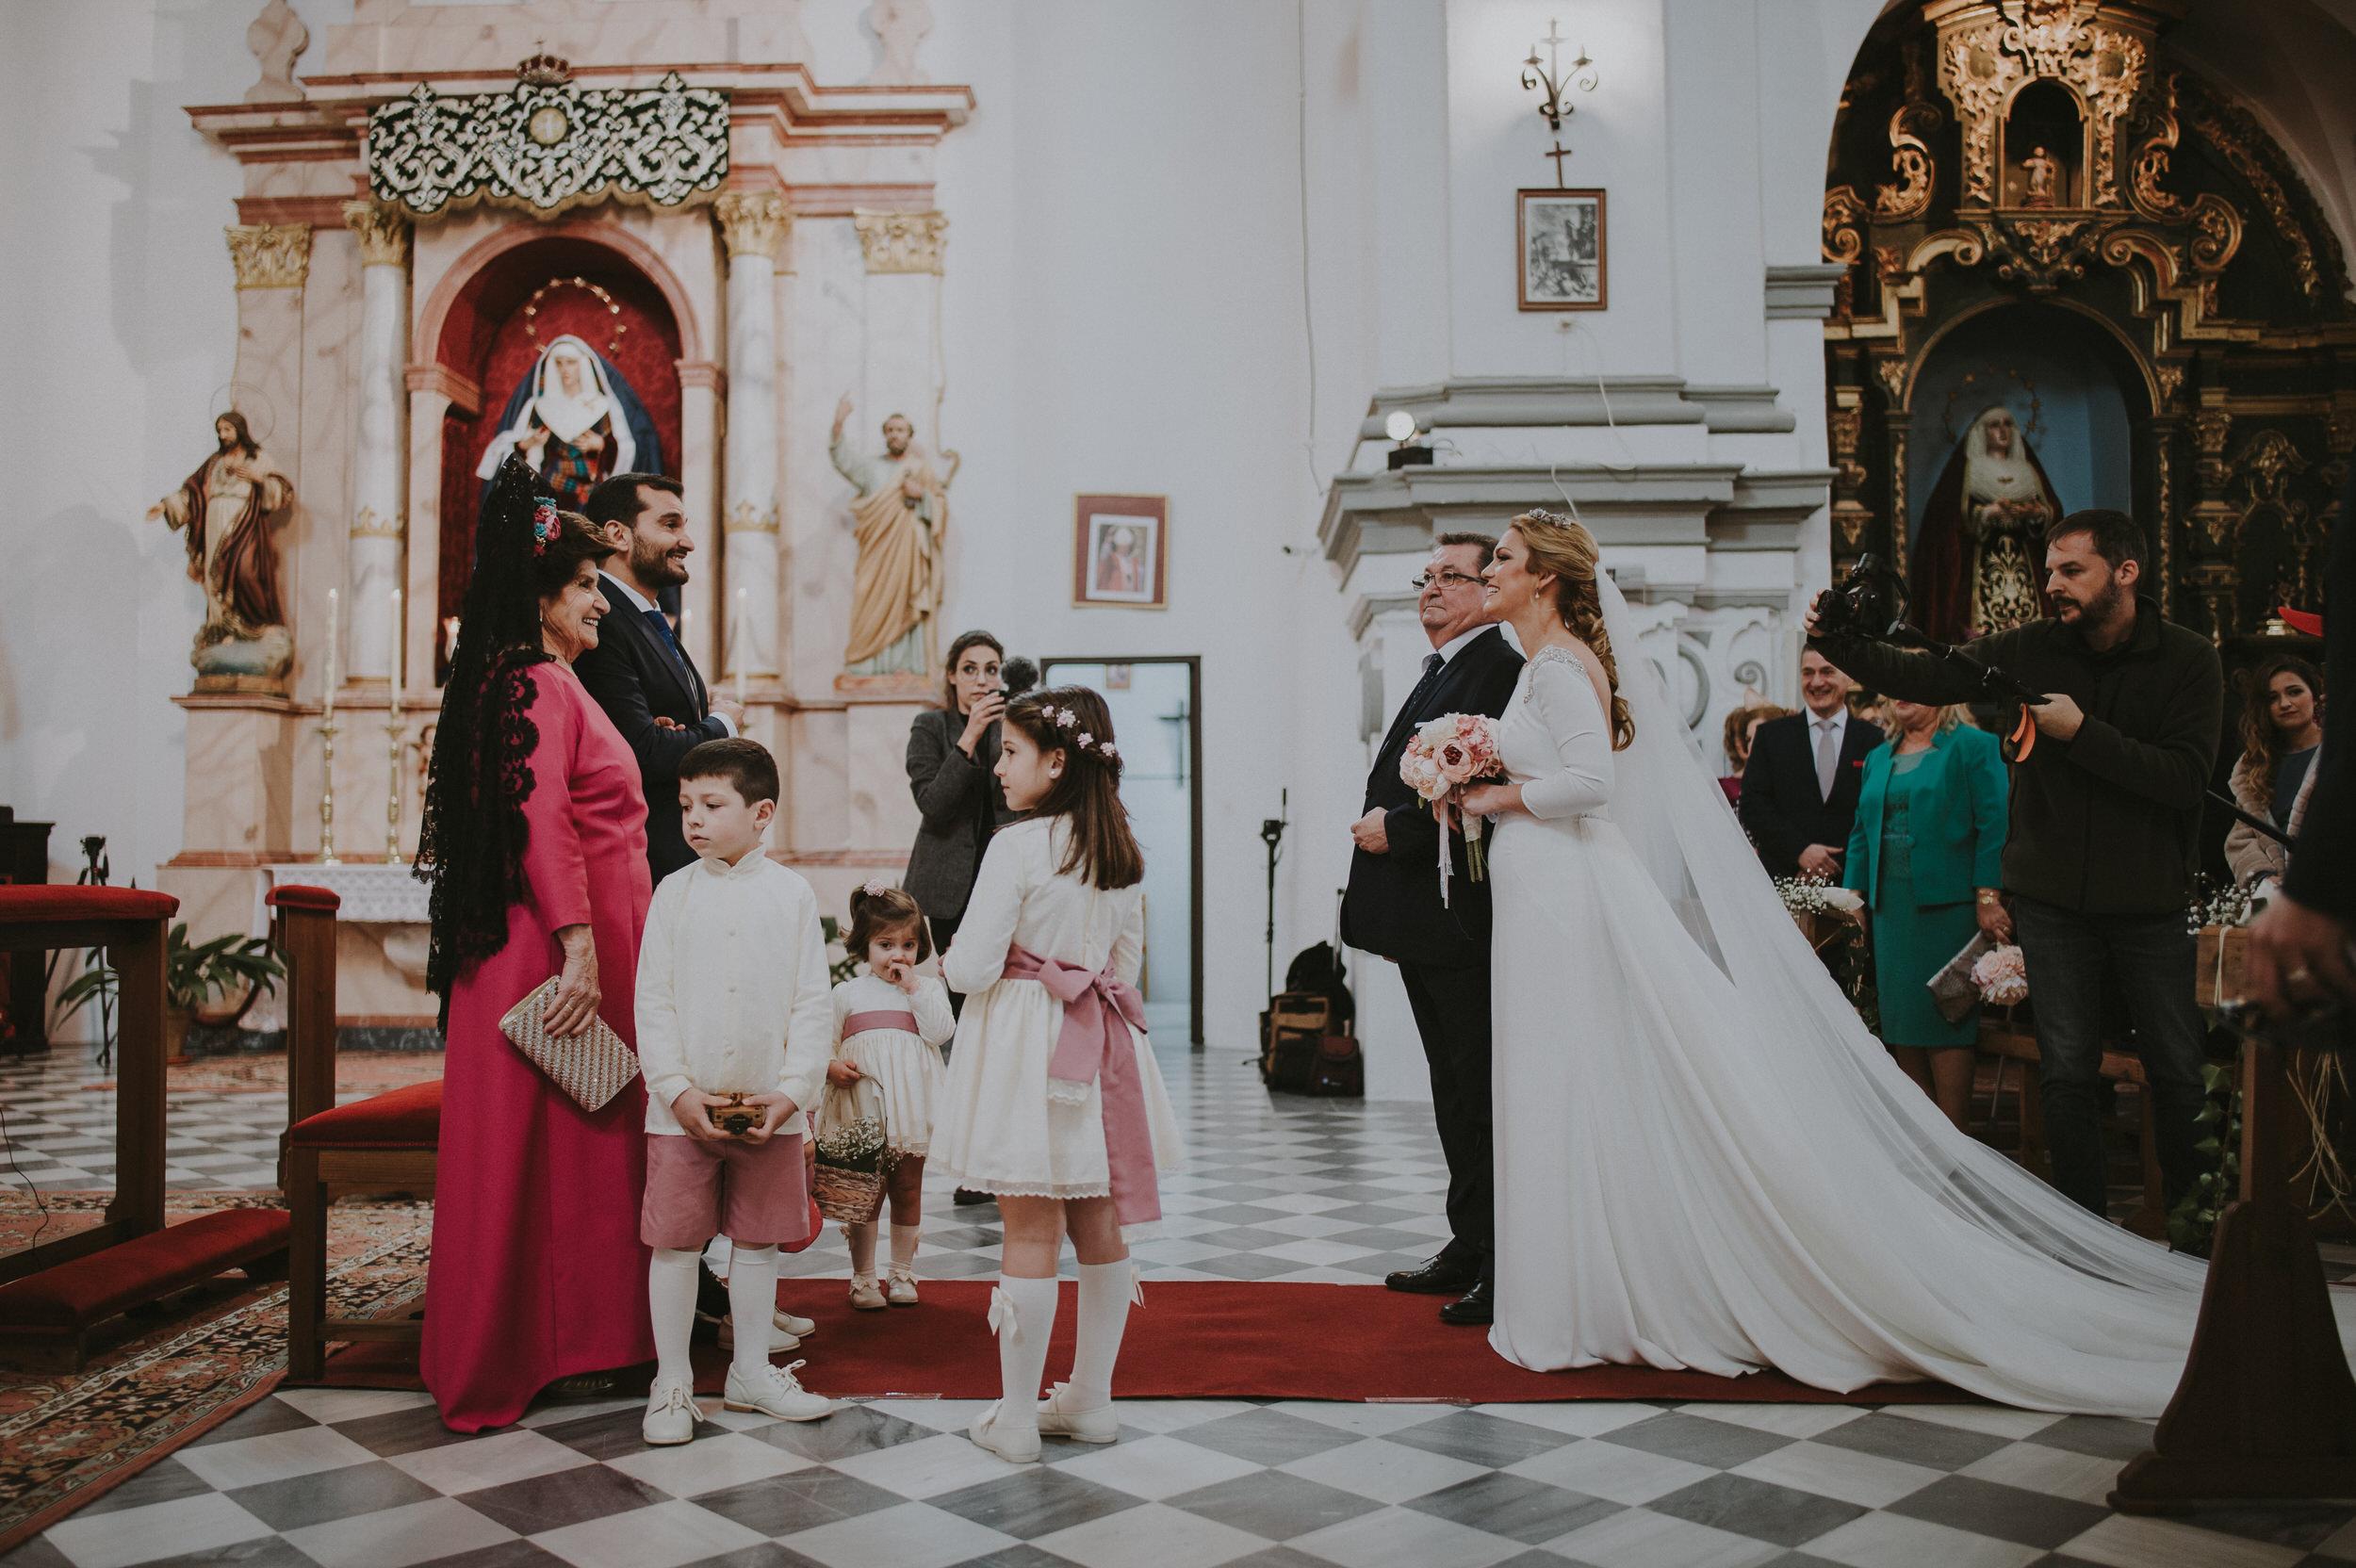 Cristina & Jero - Boda en Ecija - Iglesia Santa Ana - Fotógrafo Andrés Amarillo (25).JPG